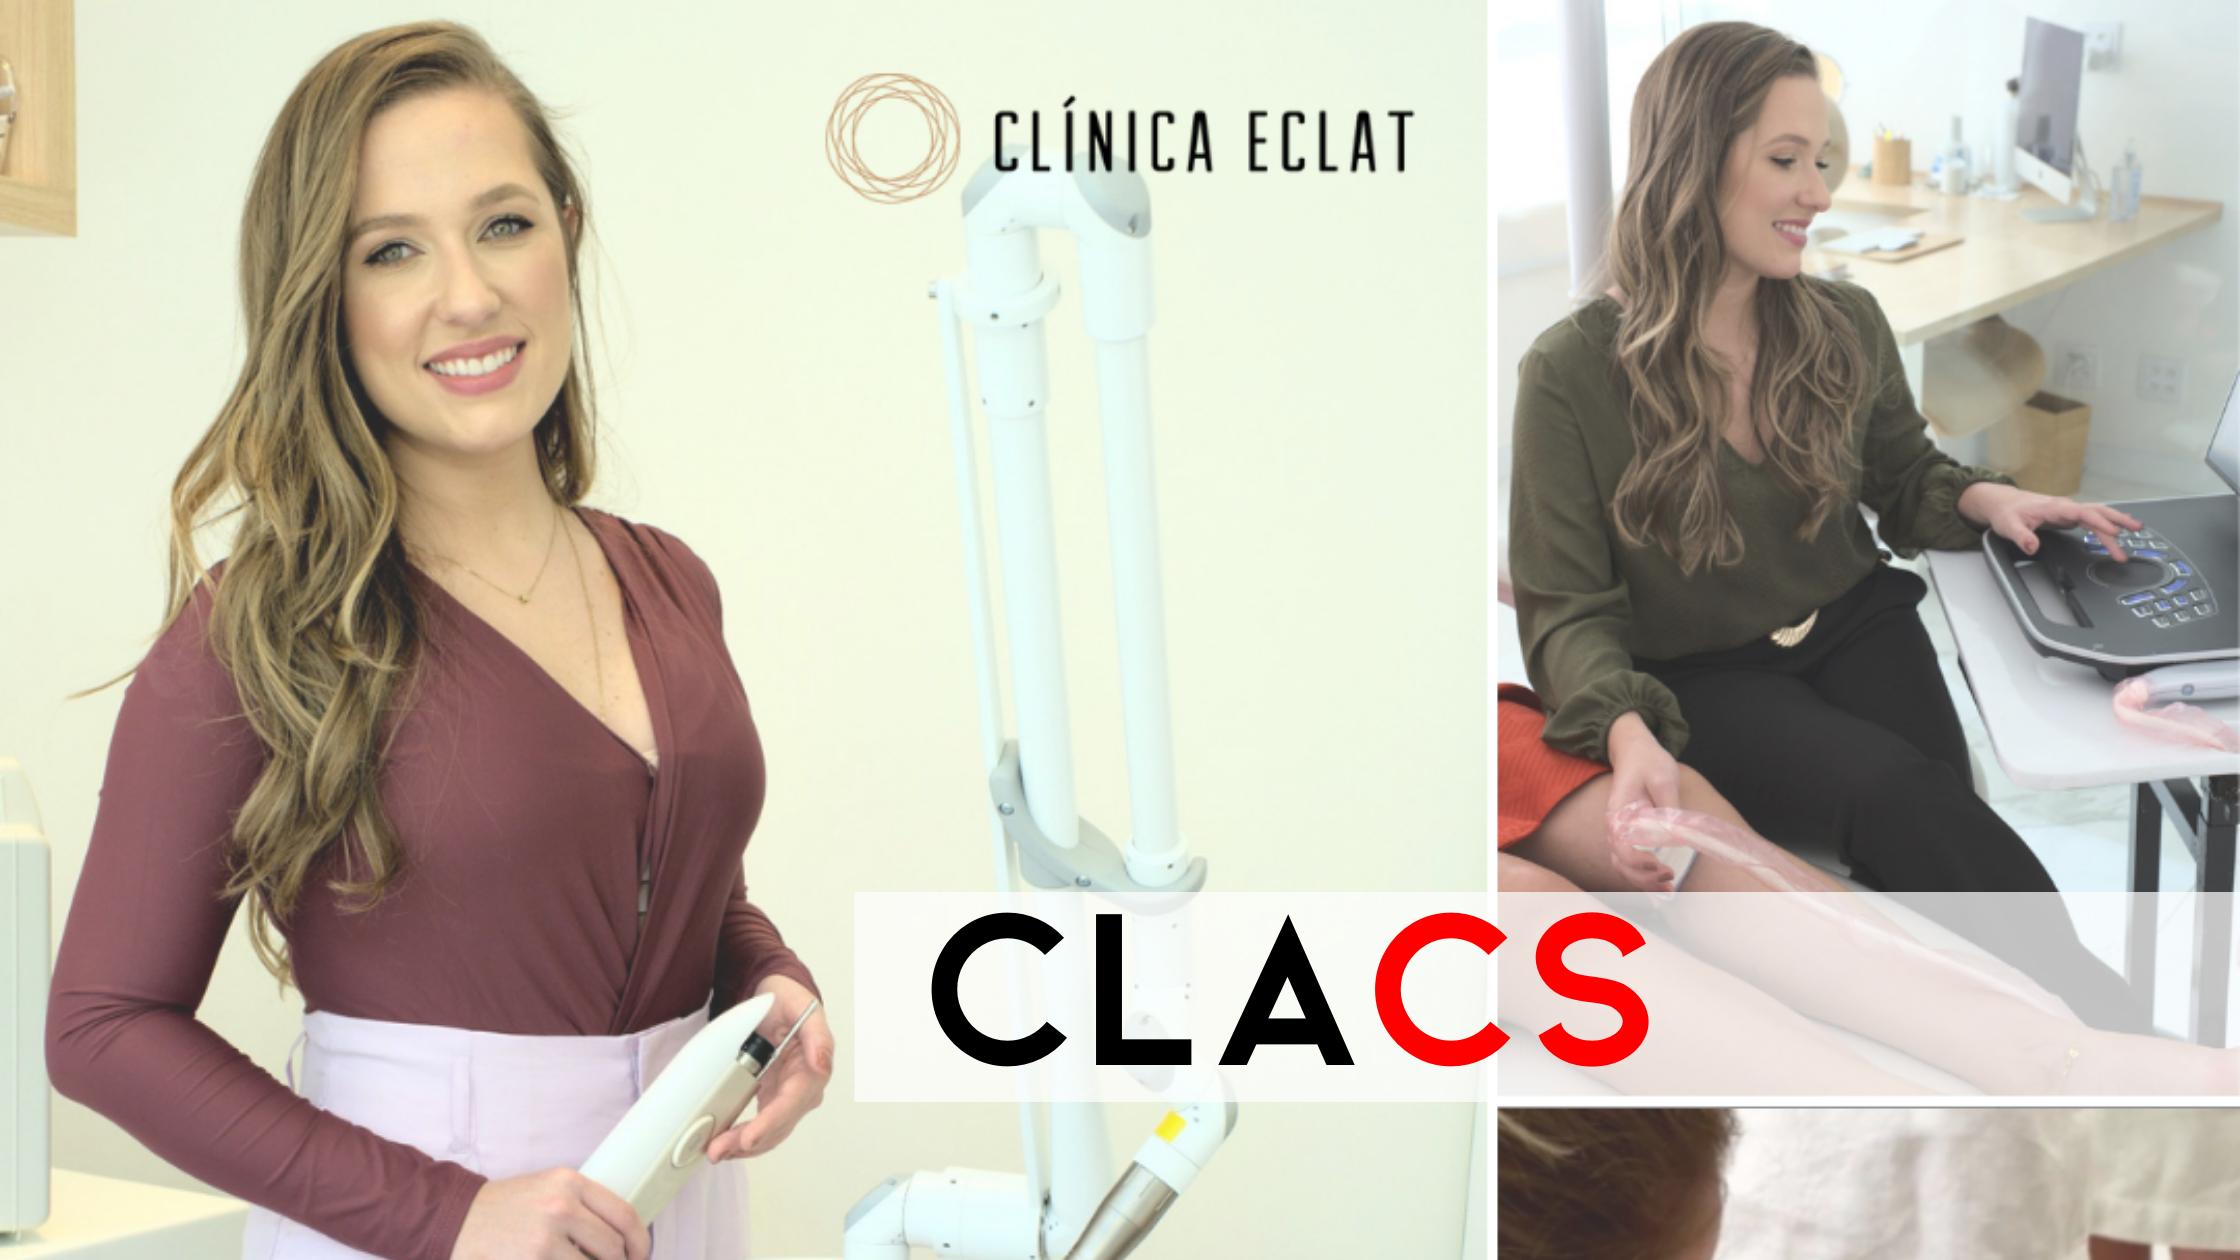 CLACS: Tratamento de varizes sem cirurgia